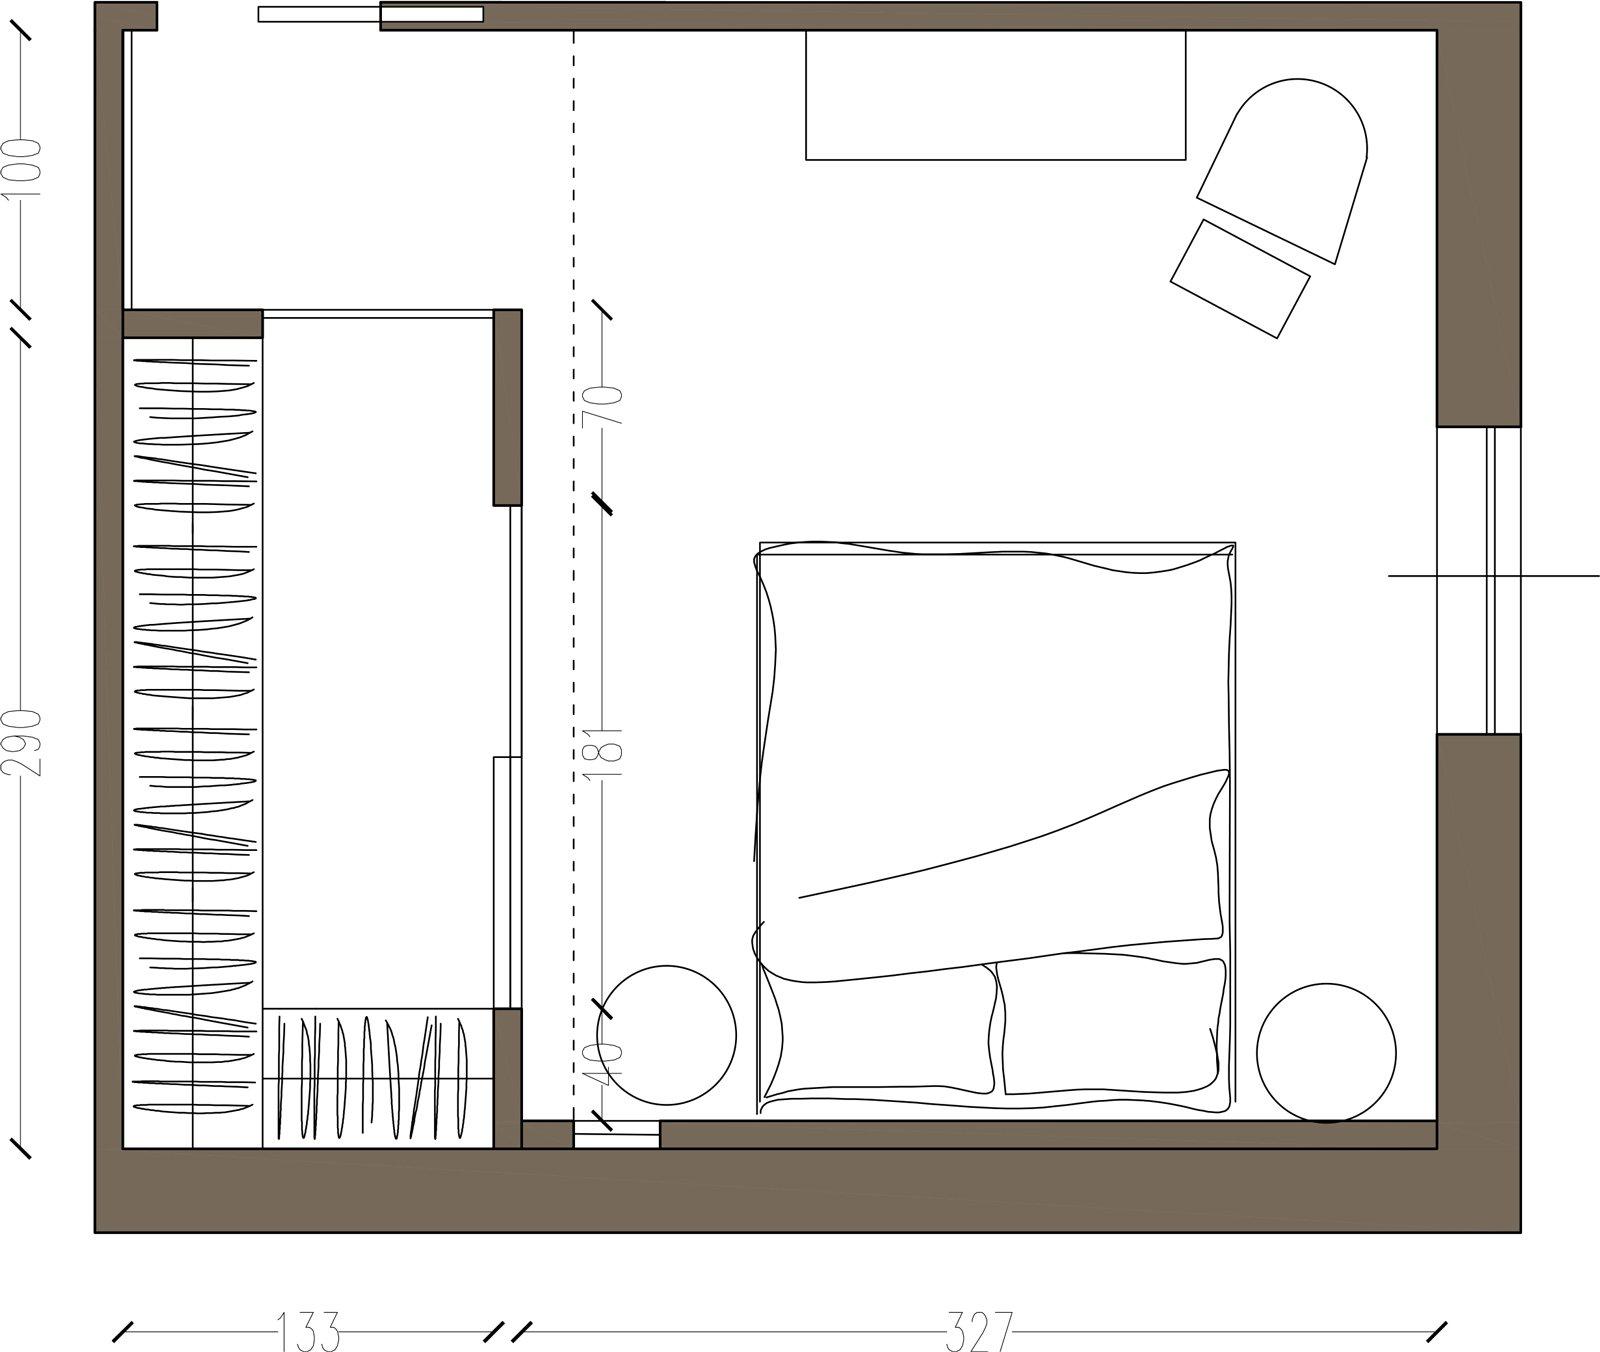 Cabina armadio due soluzioni per ricavarla cose di casa - Soluzioni per cabine armadio ...